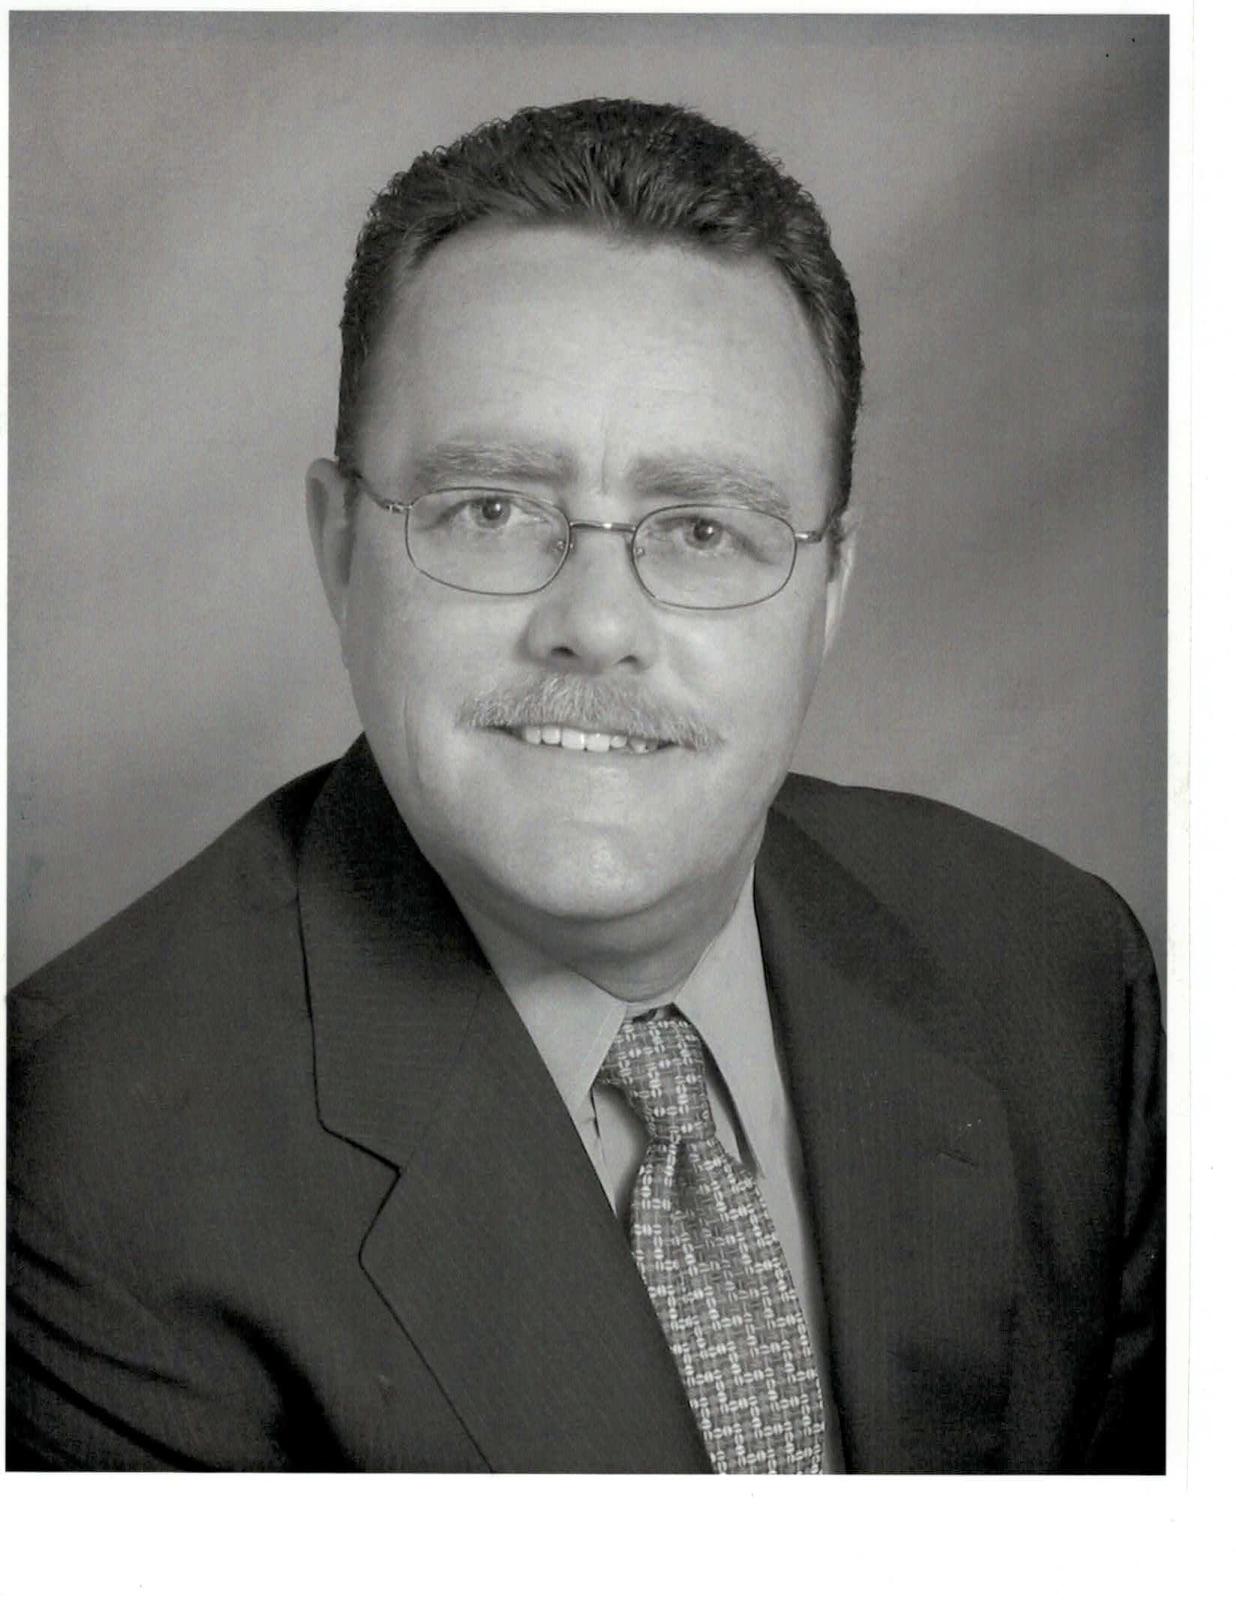 GARRETT BEYER 2005-06